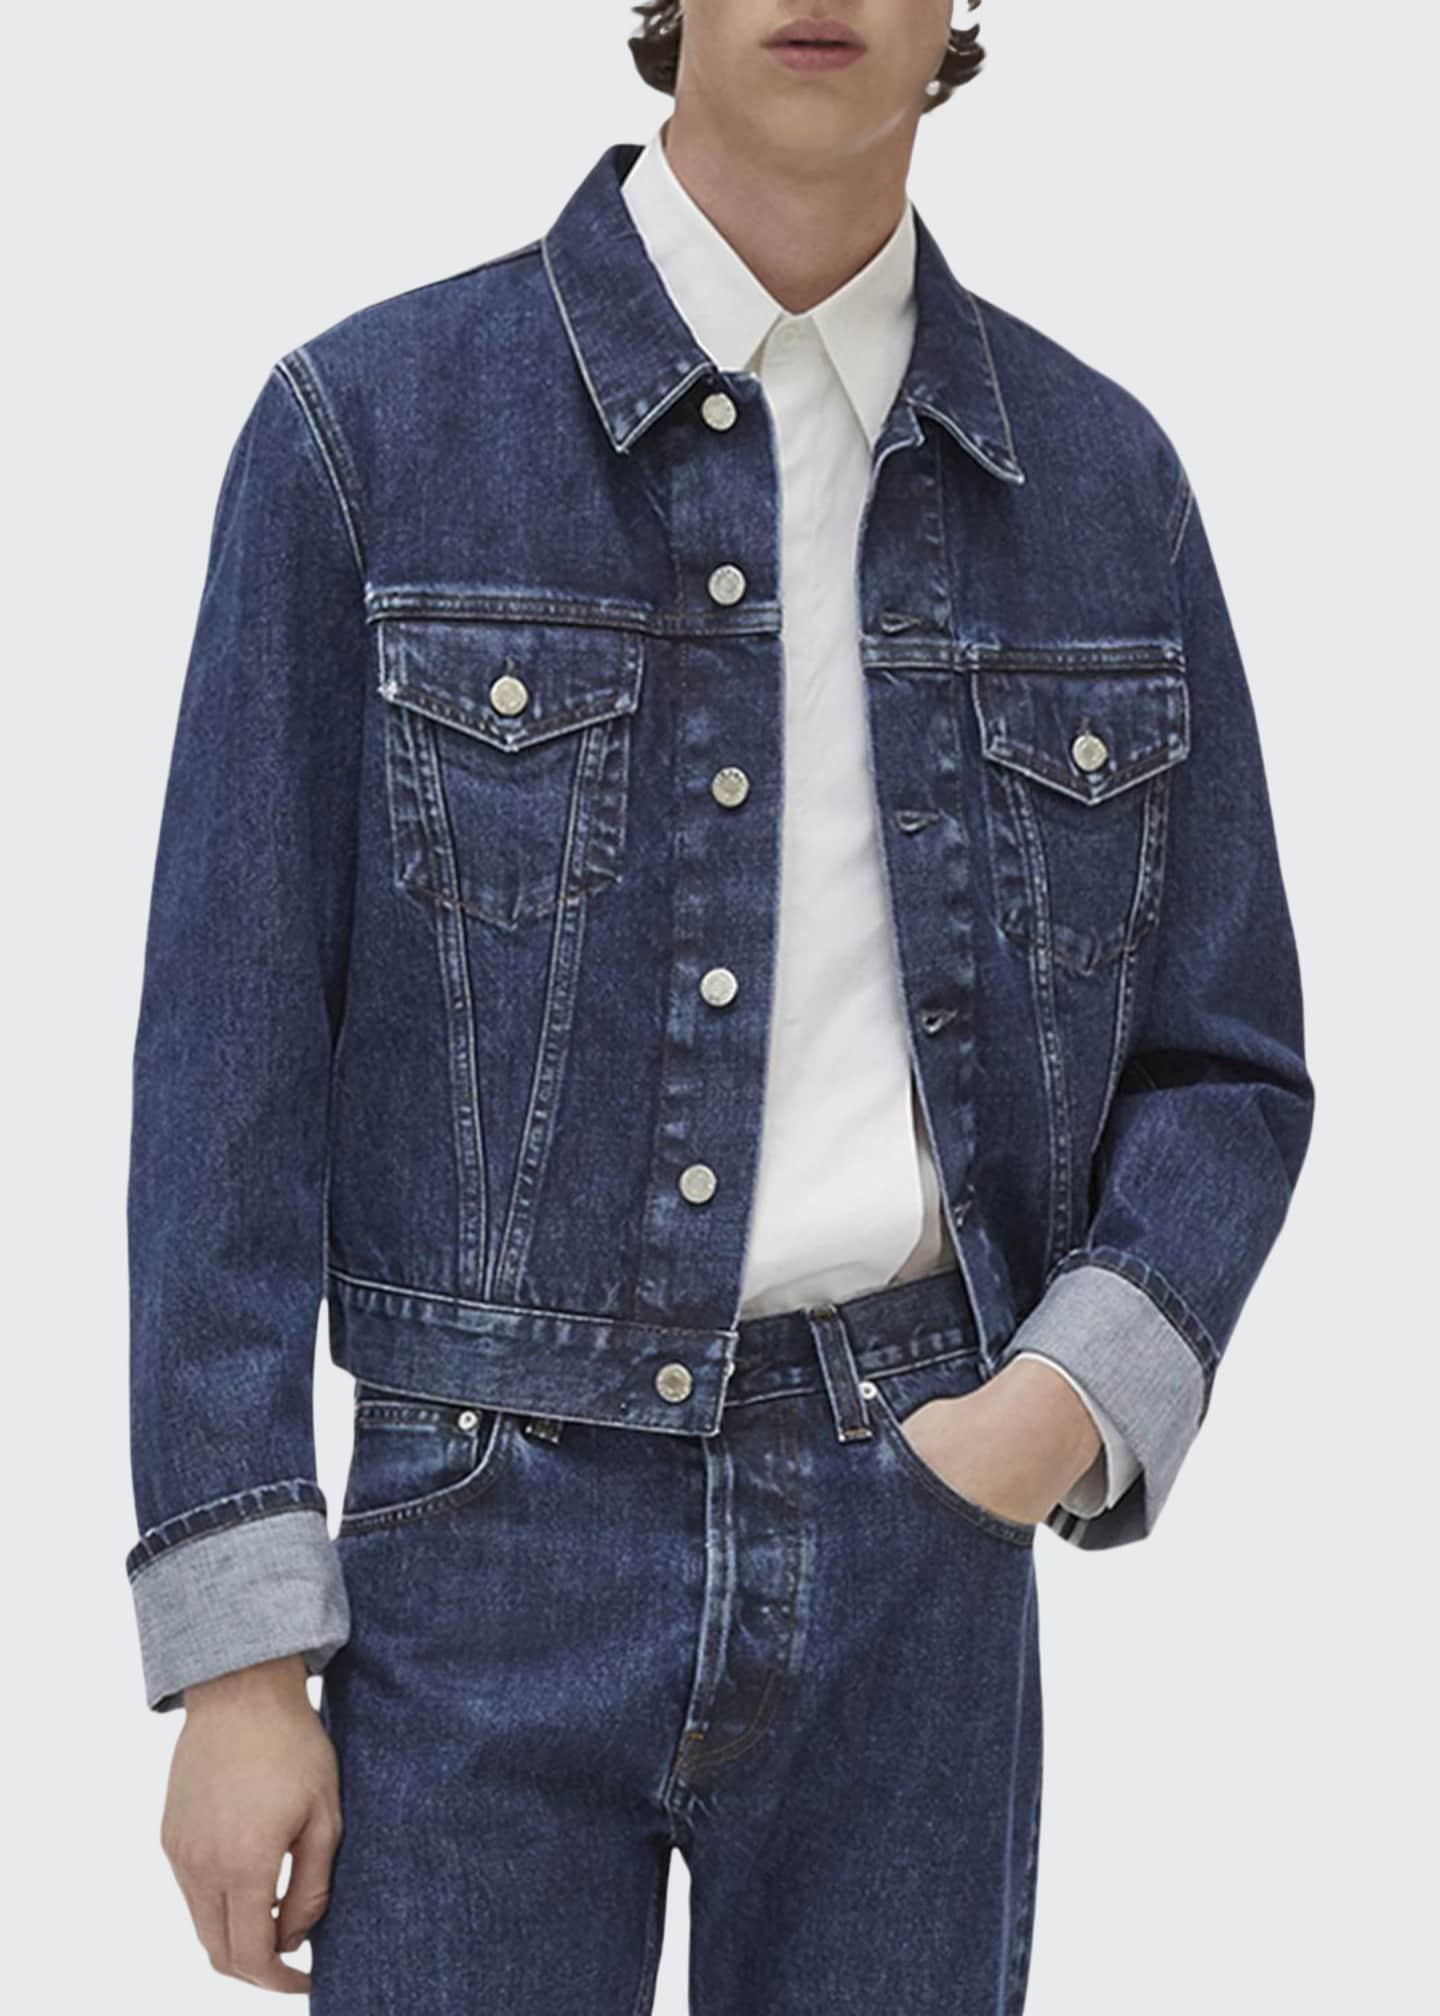 Helmut Lang Men's Dark Stone-Wash Denim Trucker Jacket